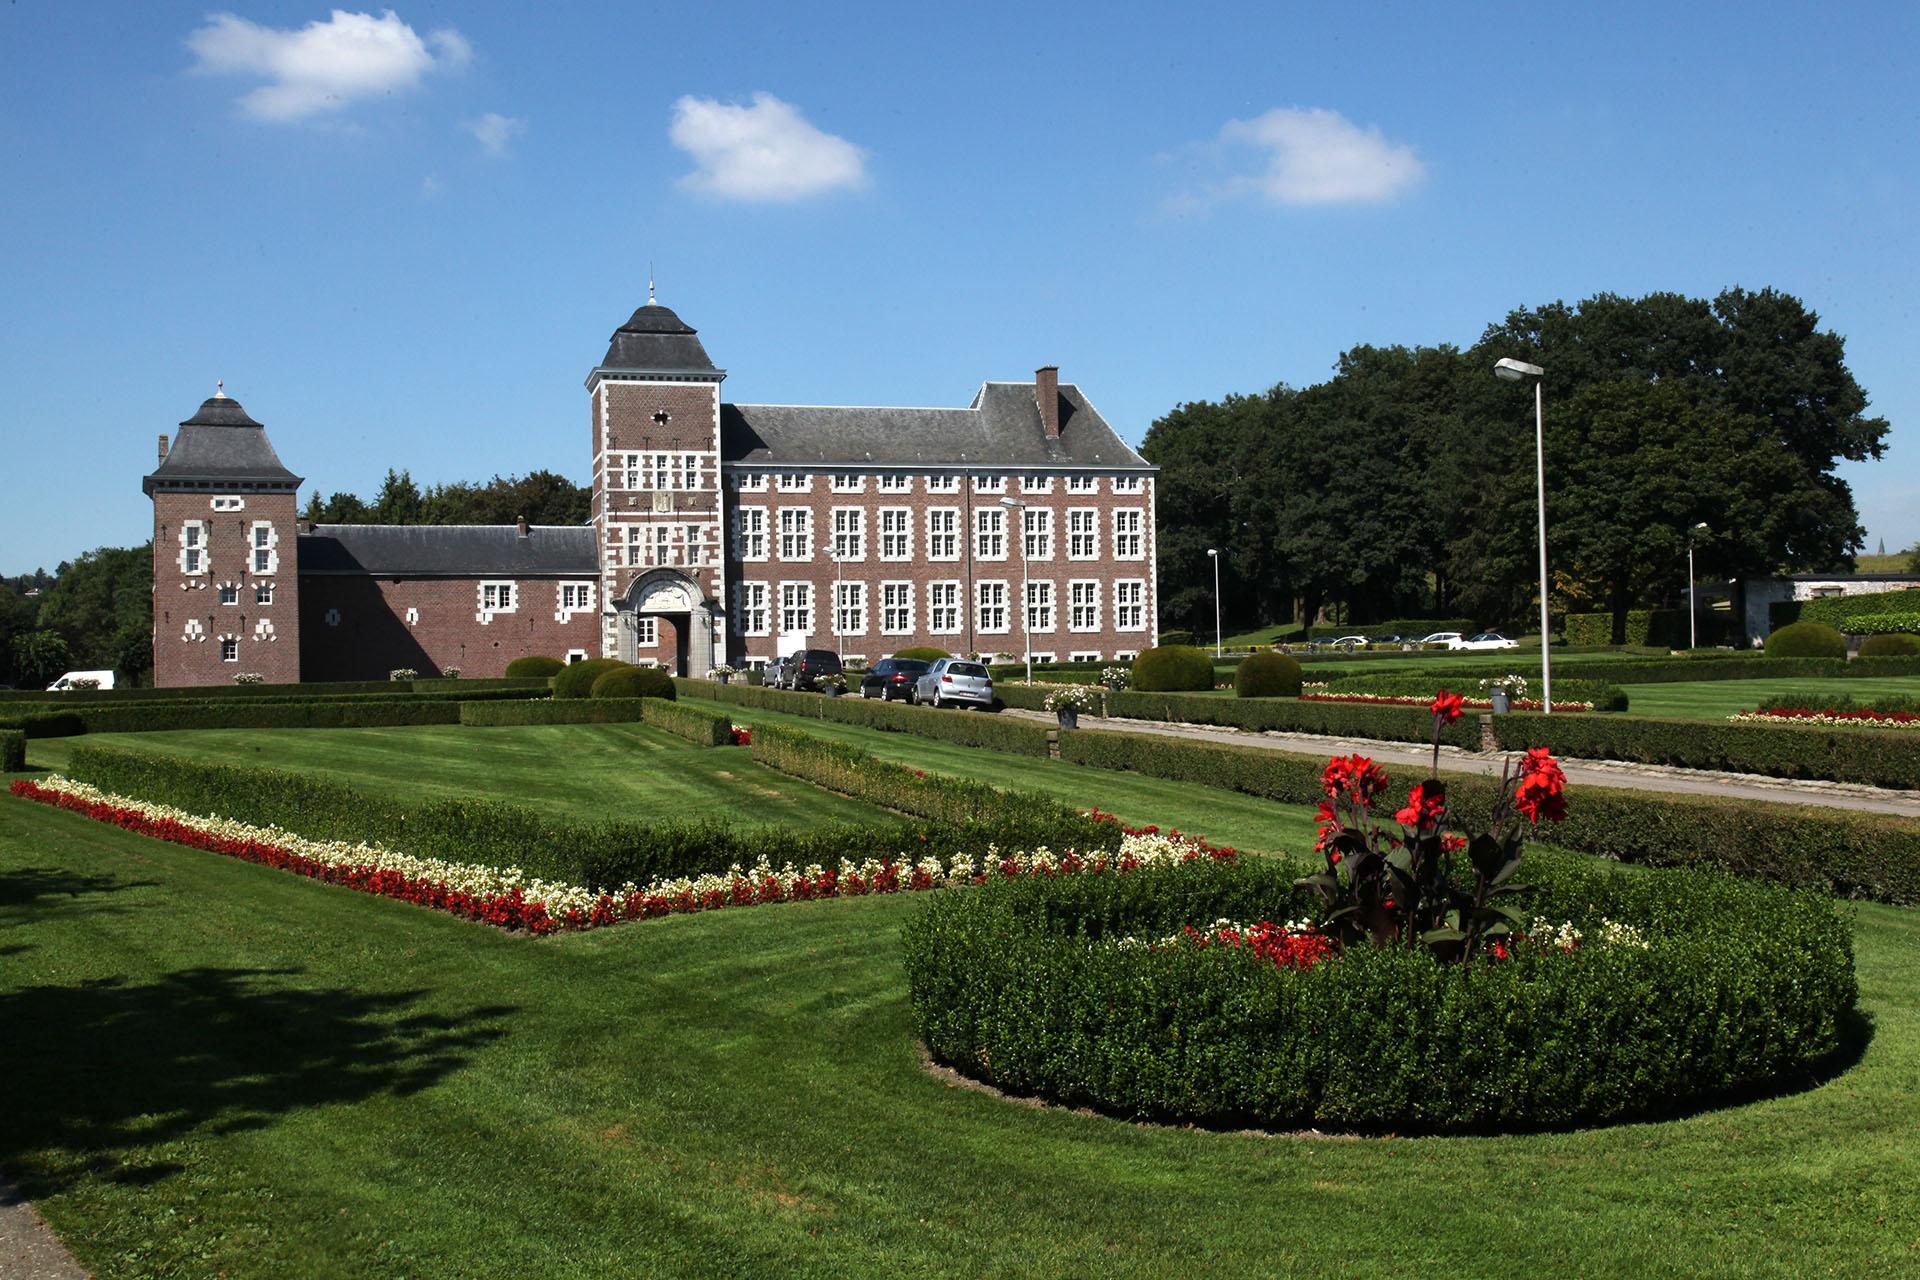 Domaine provincial de Wégimont - Wégimont - Façade et jardin